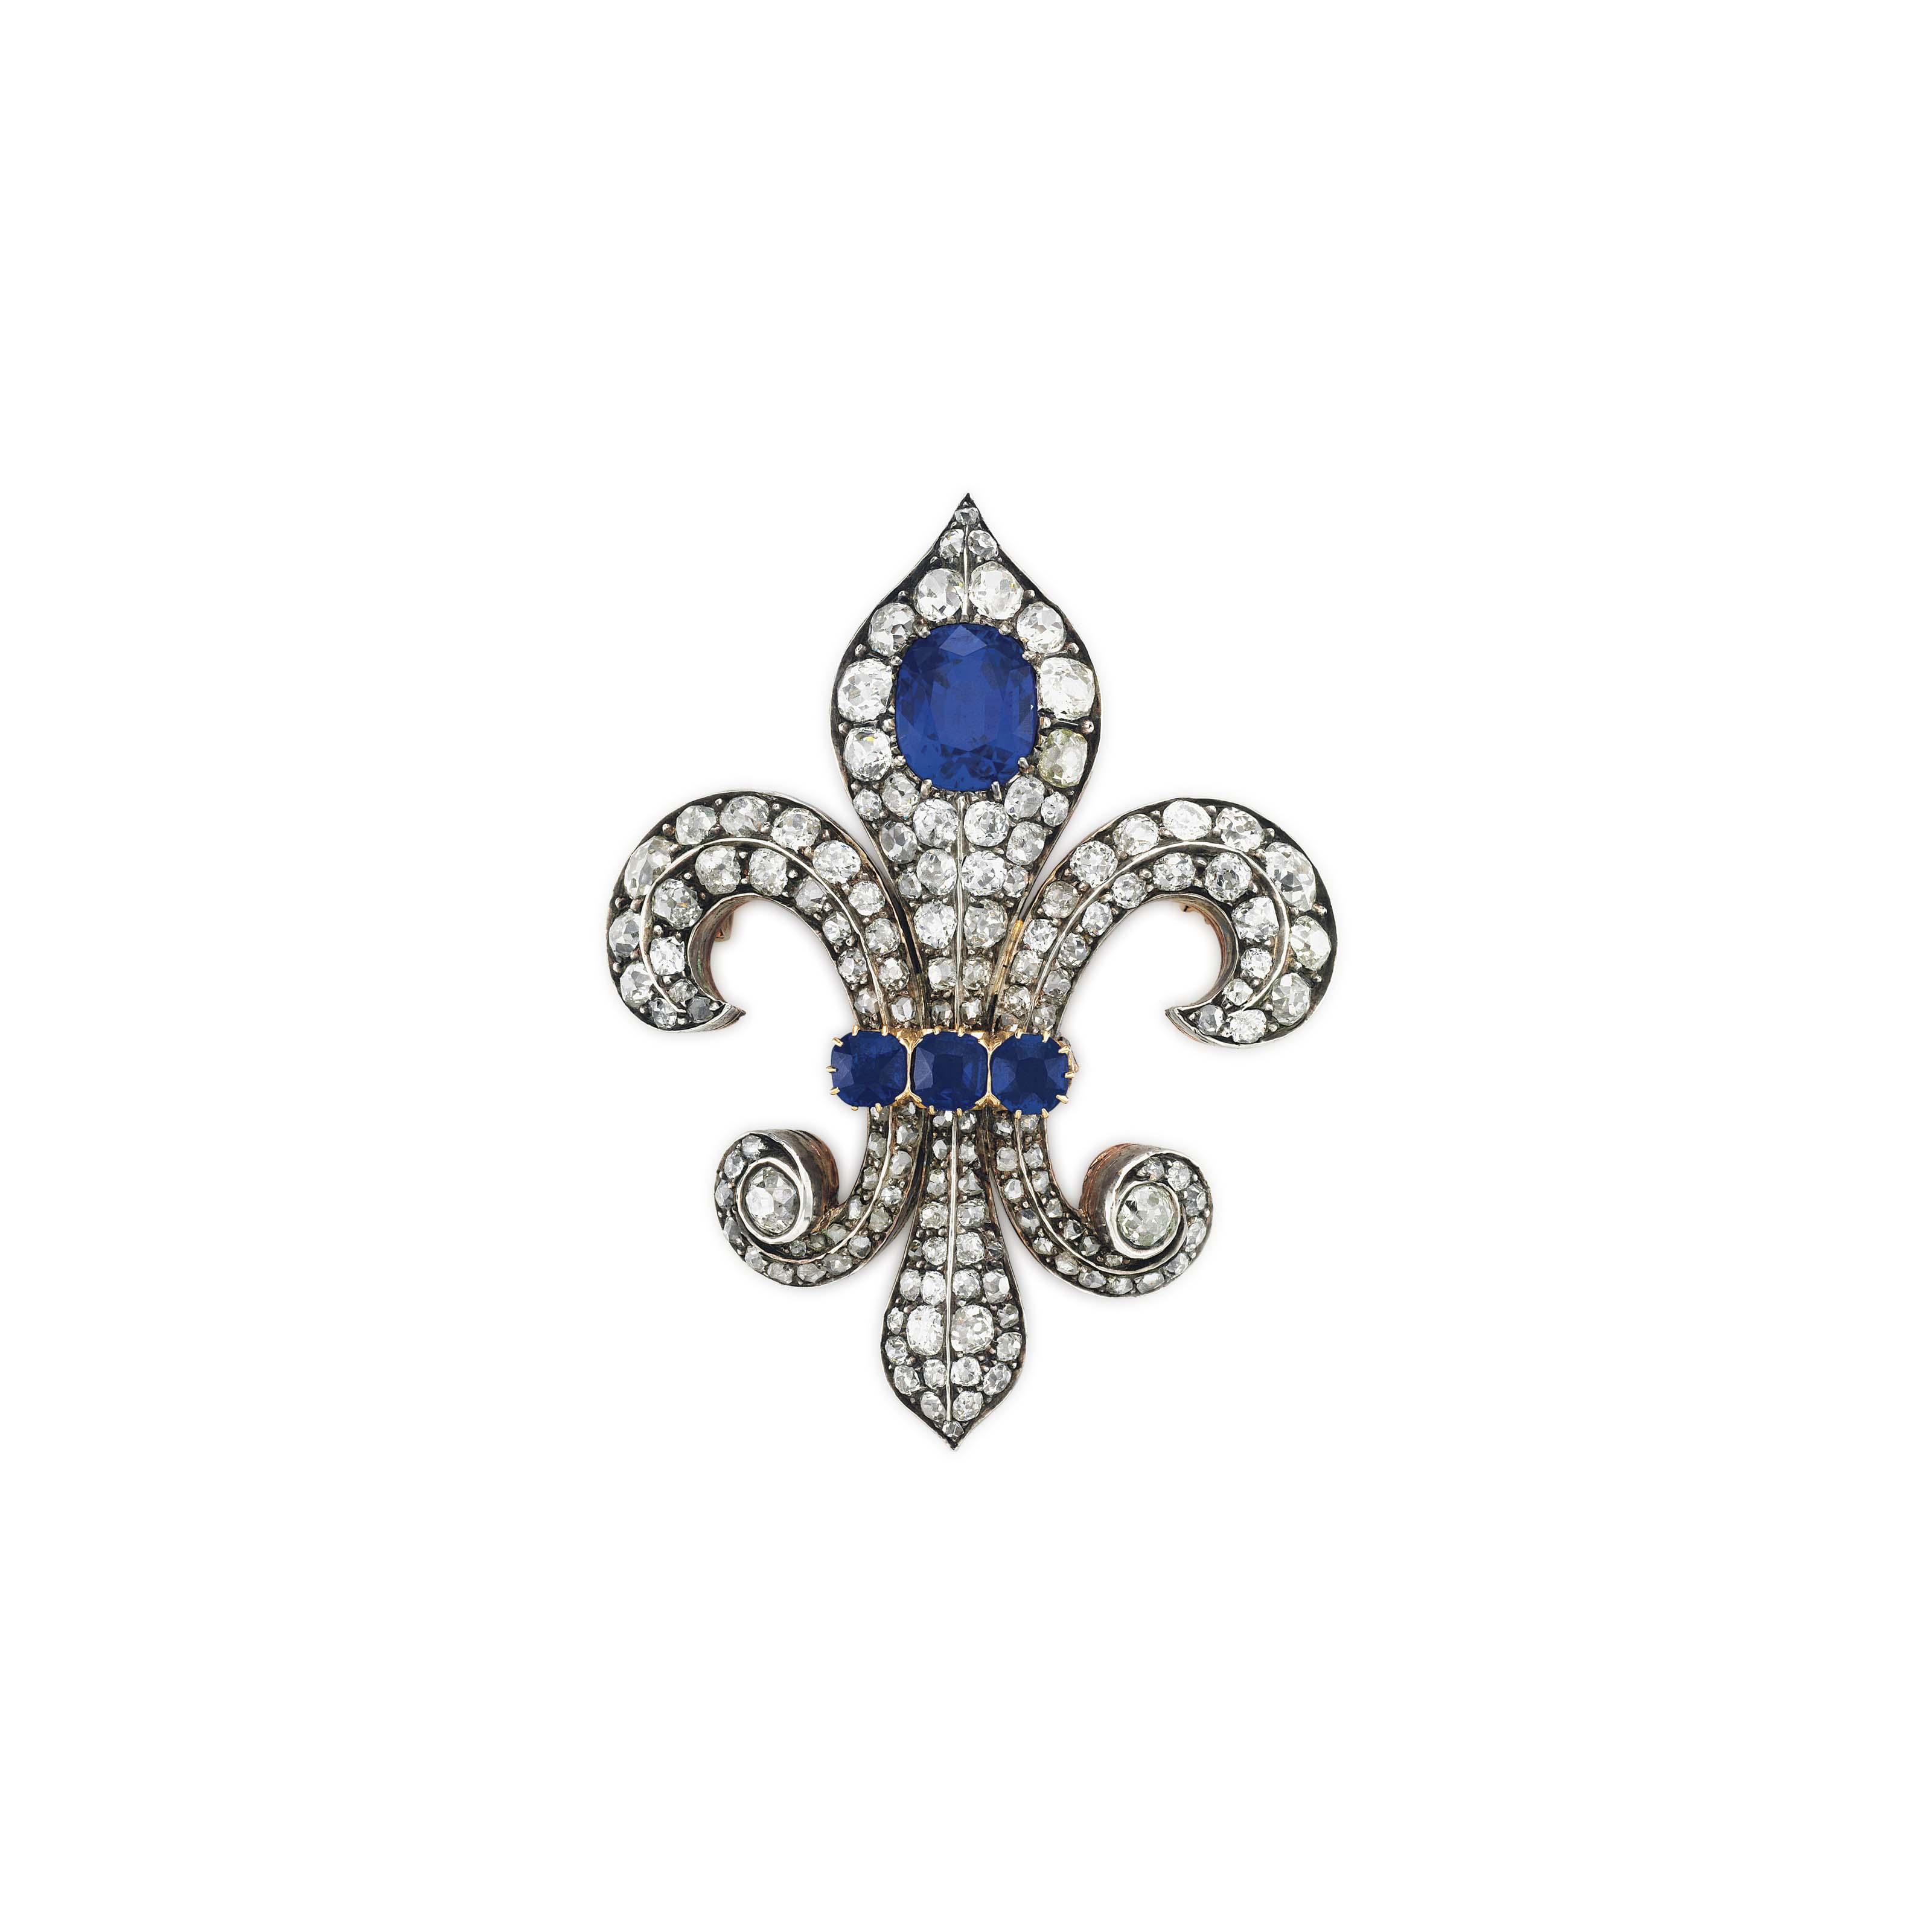 892951b43 AN ANTIQUE SAPPHIRE AND DIAMOND BROOCH | brooch, diamond | Christie's